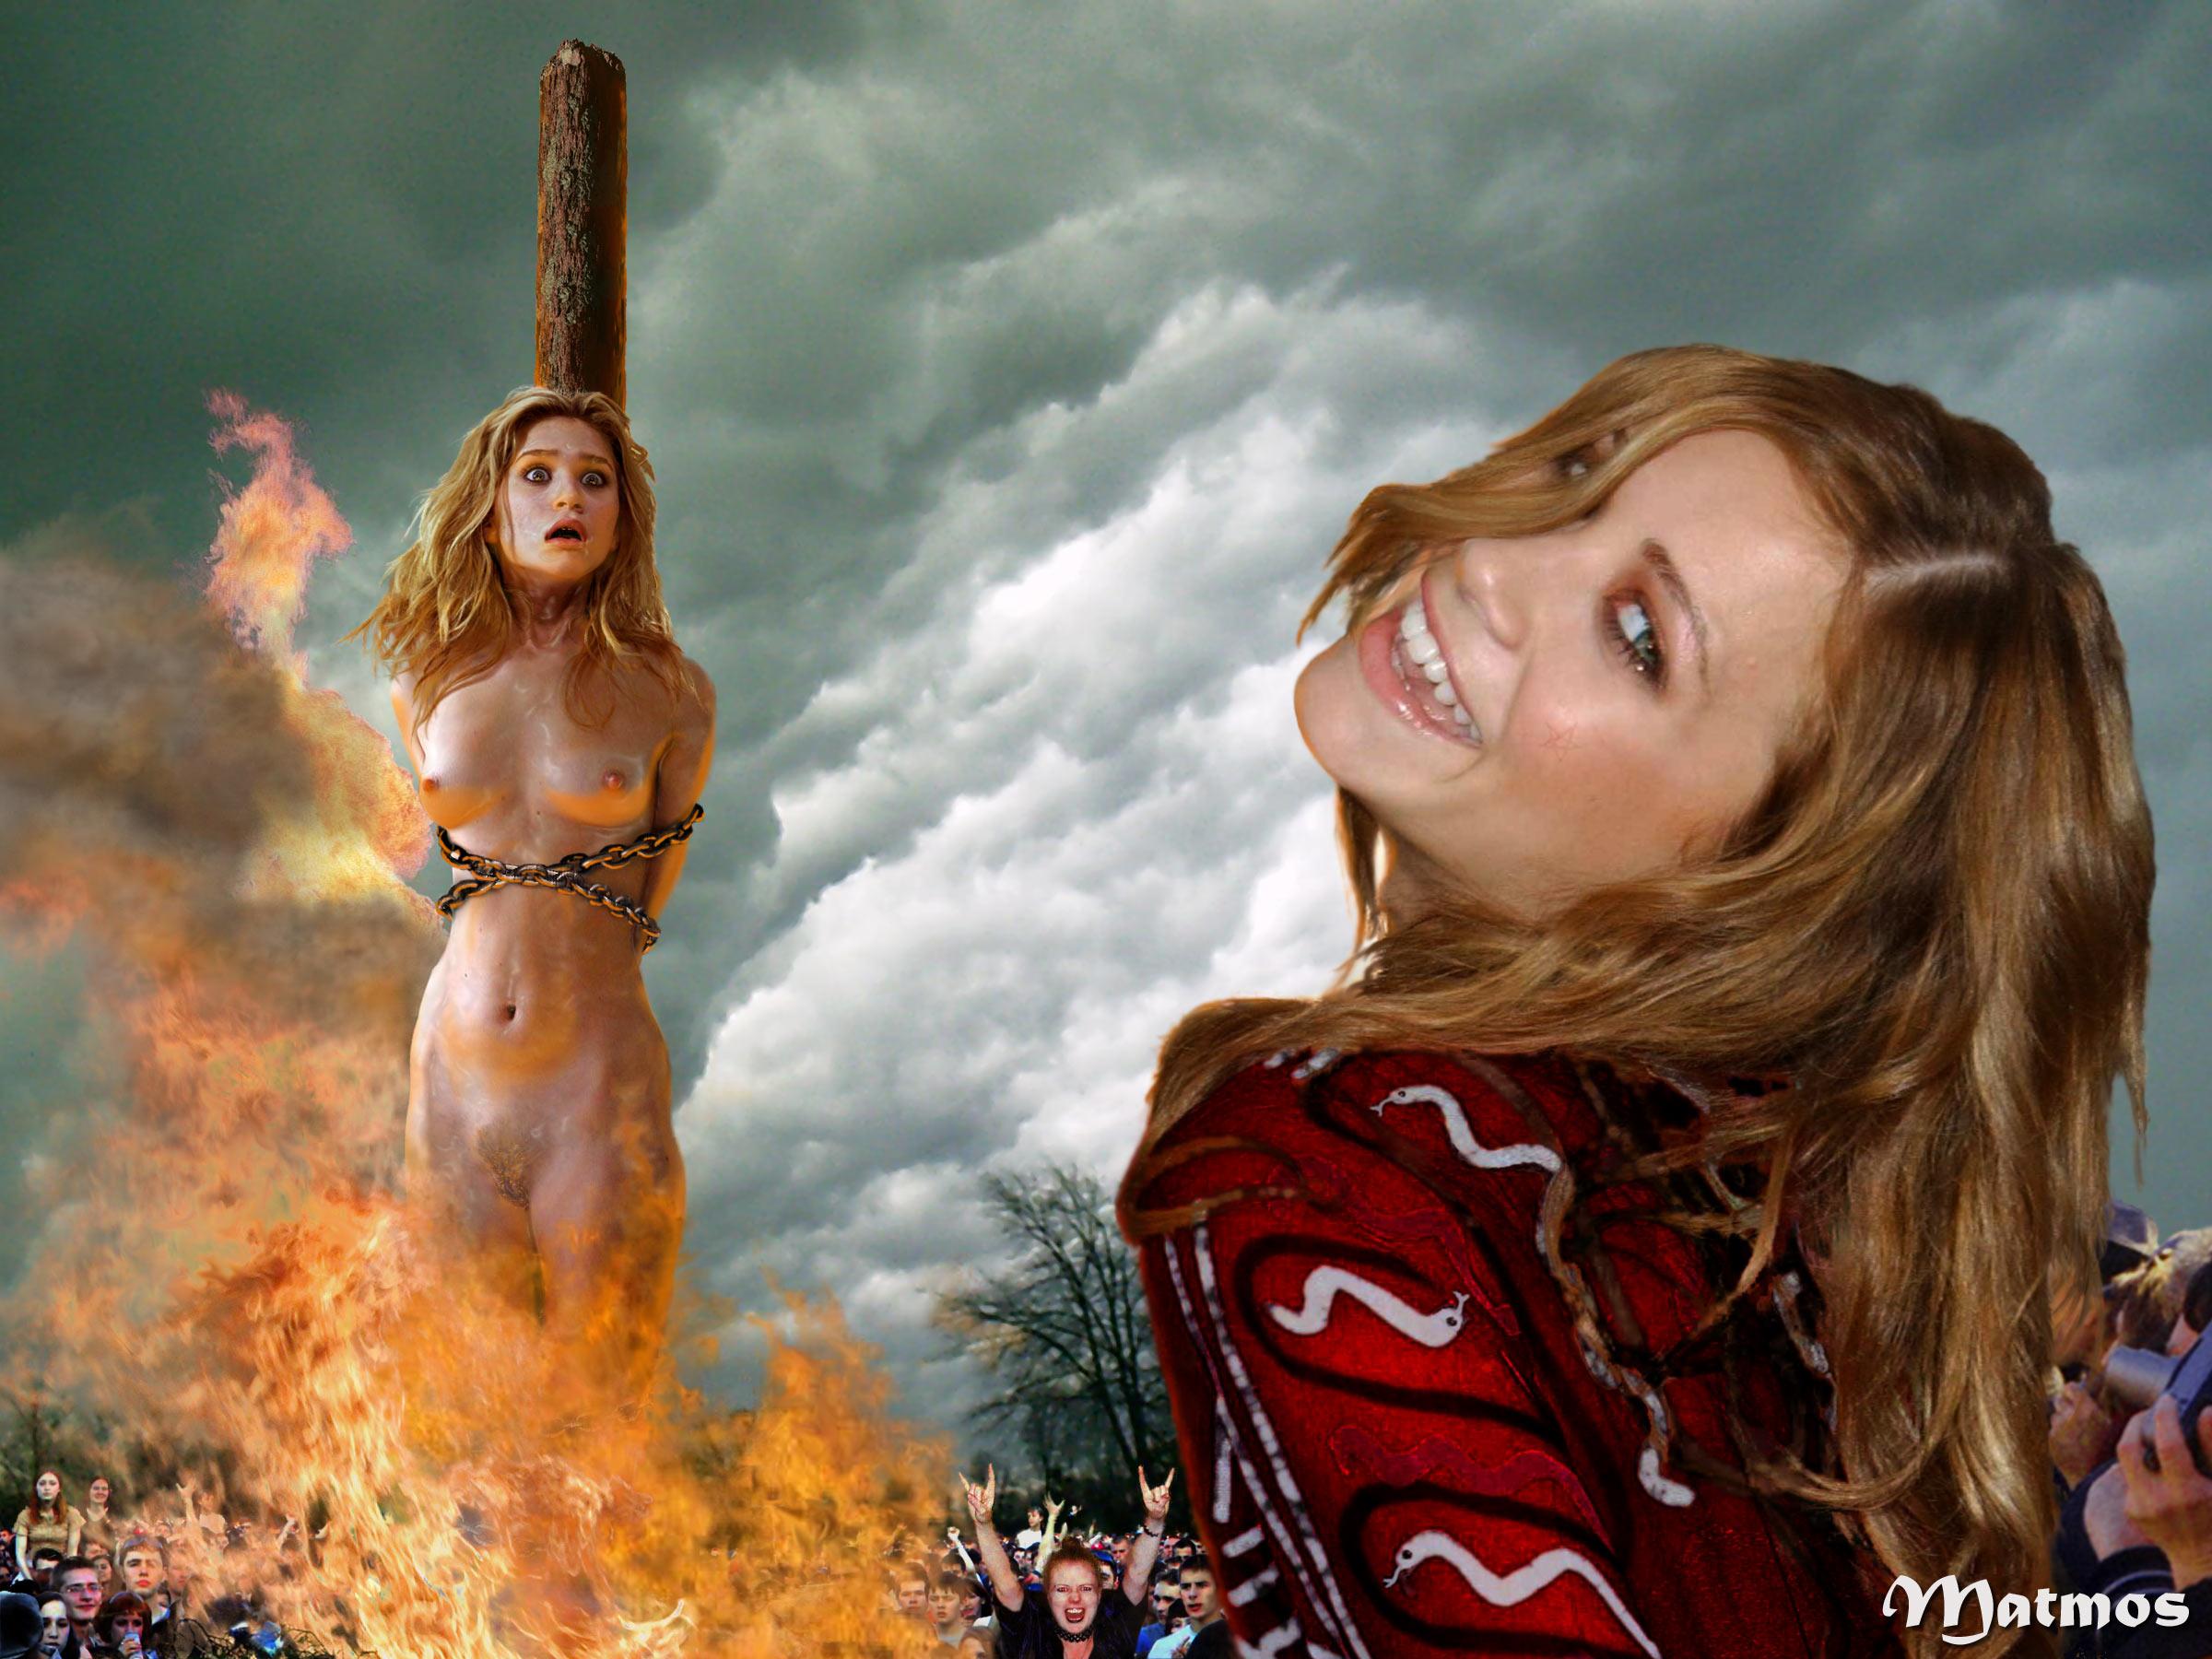 Nude girls burning alive